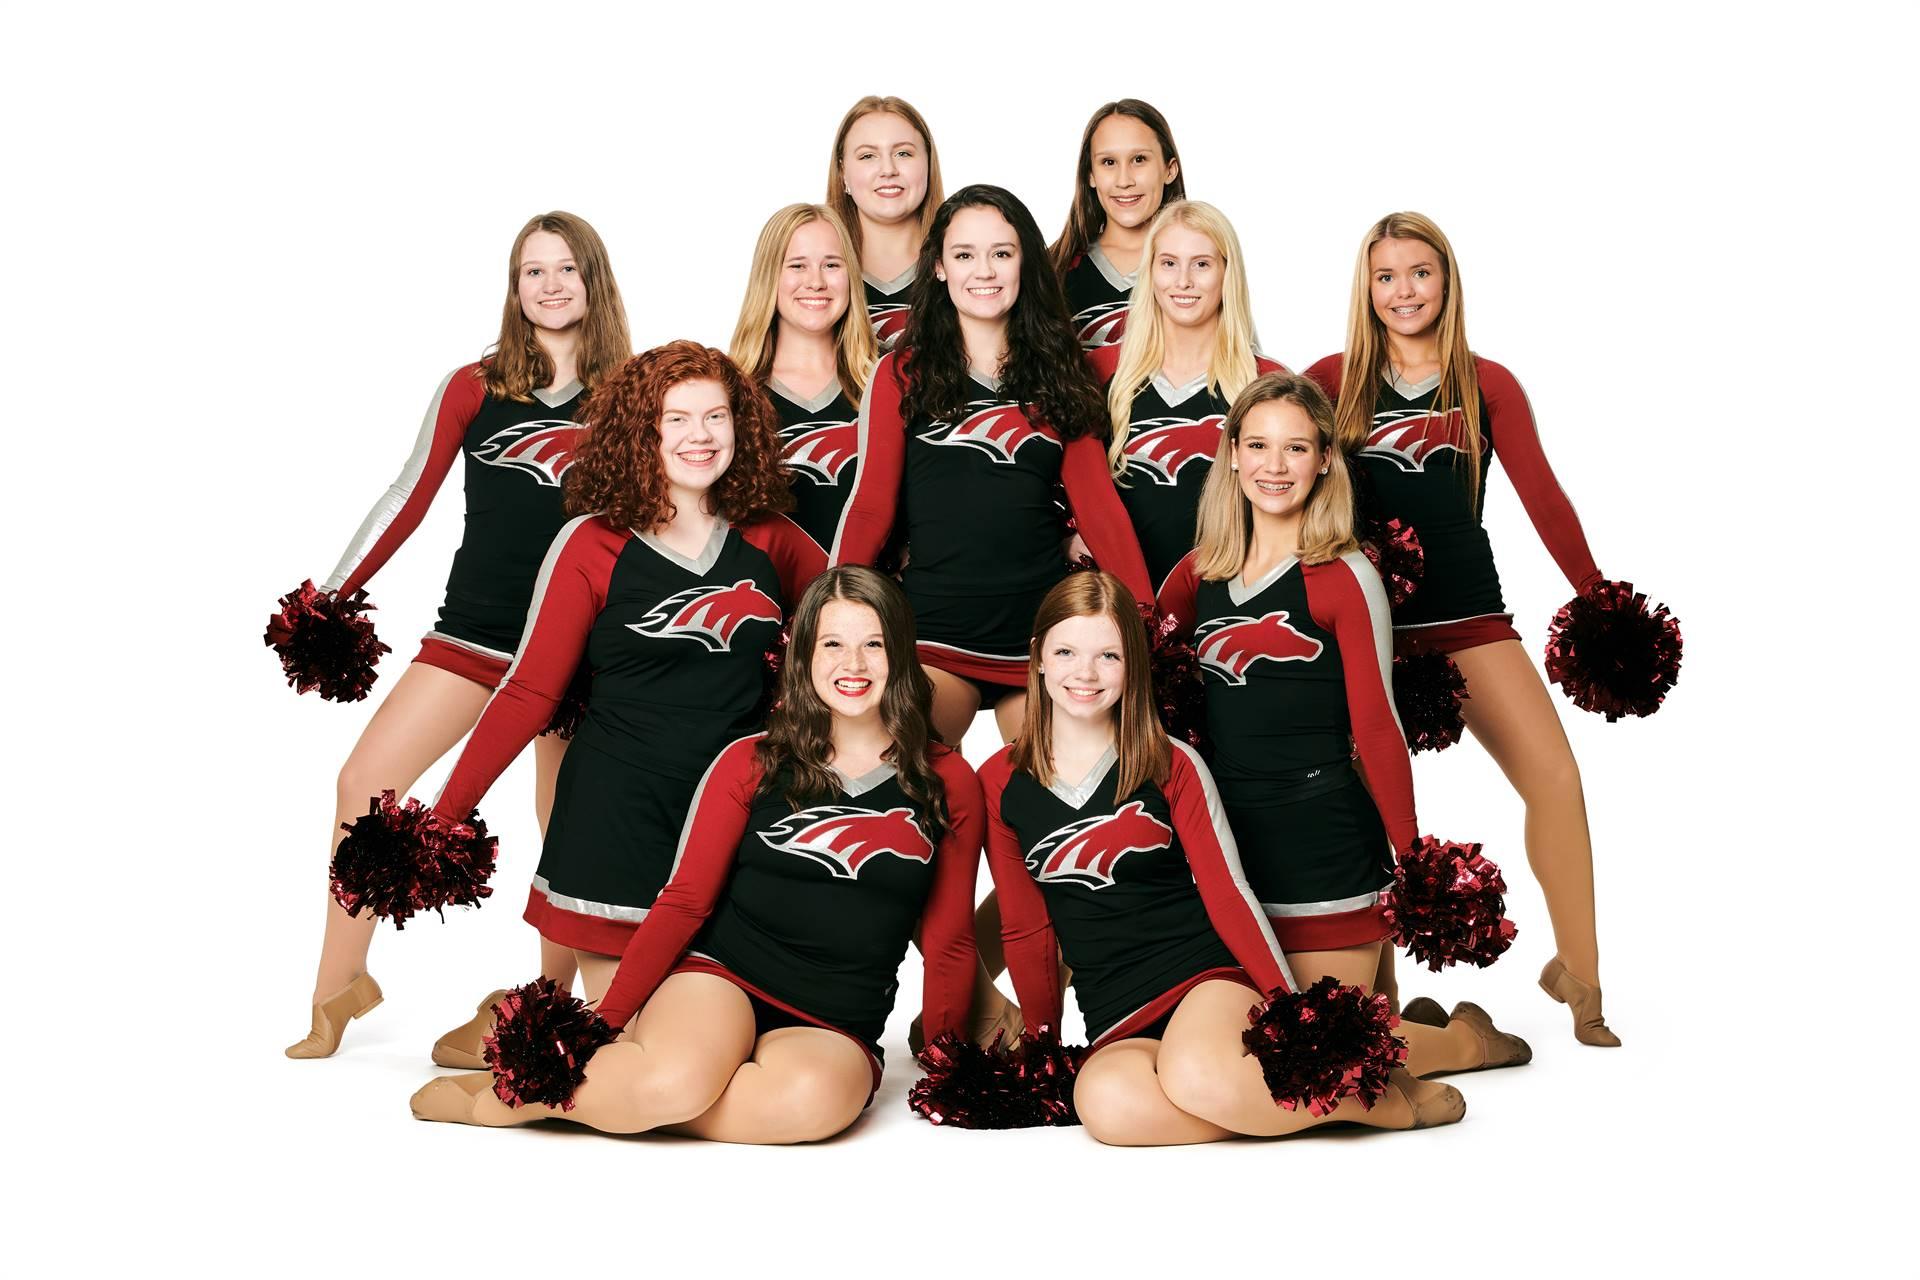 Mustangs Dance Team 2019-20